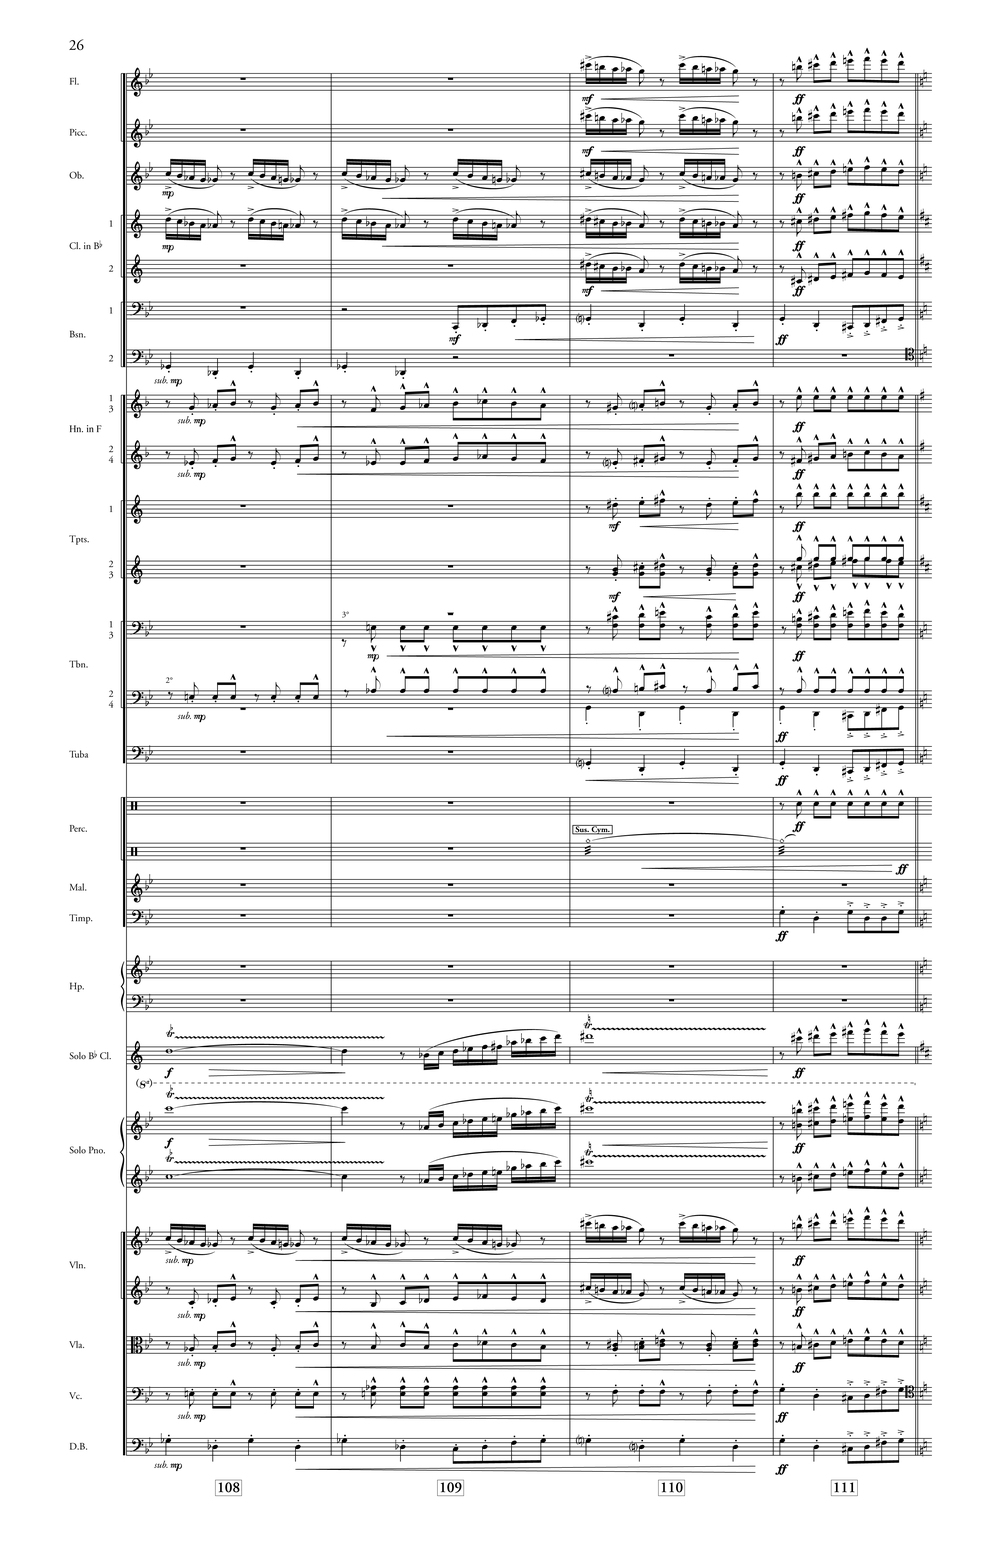 orchestra score.jpg